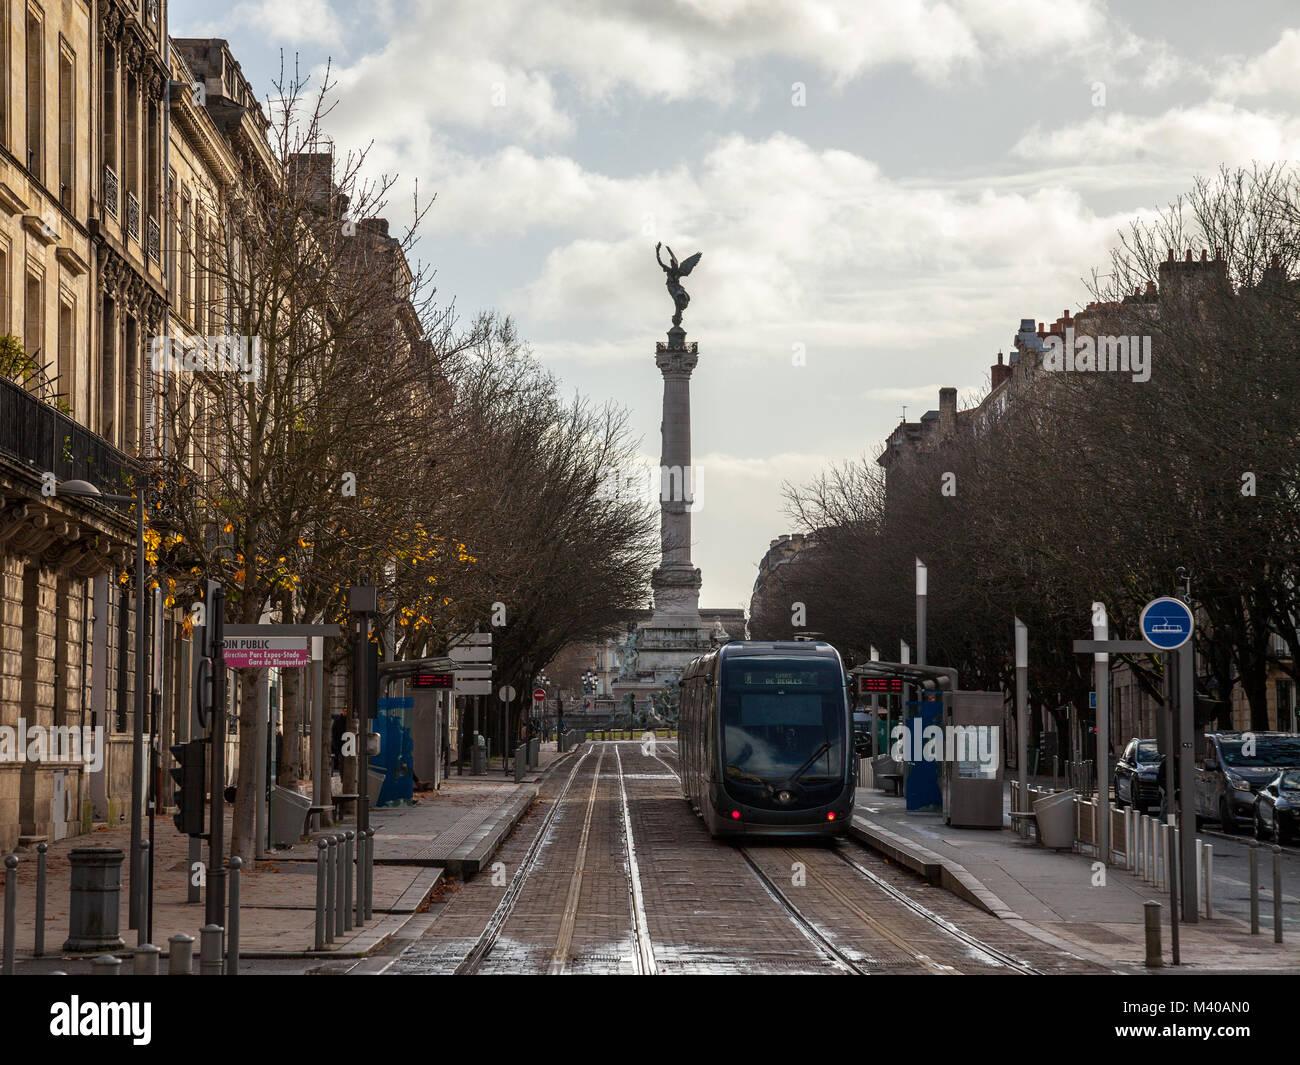 BORDEAUX, FRANCE - DECEMBER 27, 2017: Bordeaux tram stop on line C (Jardin Public) with the monumental column of - Stock Image